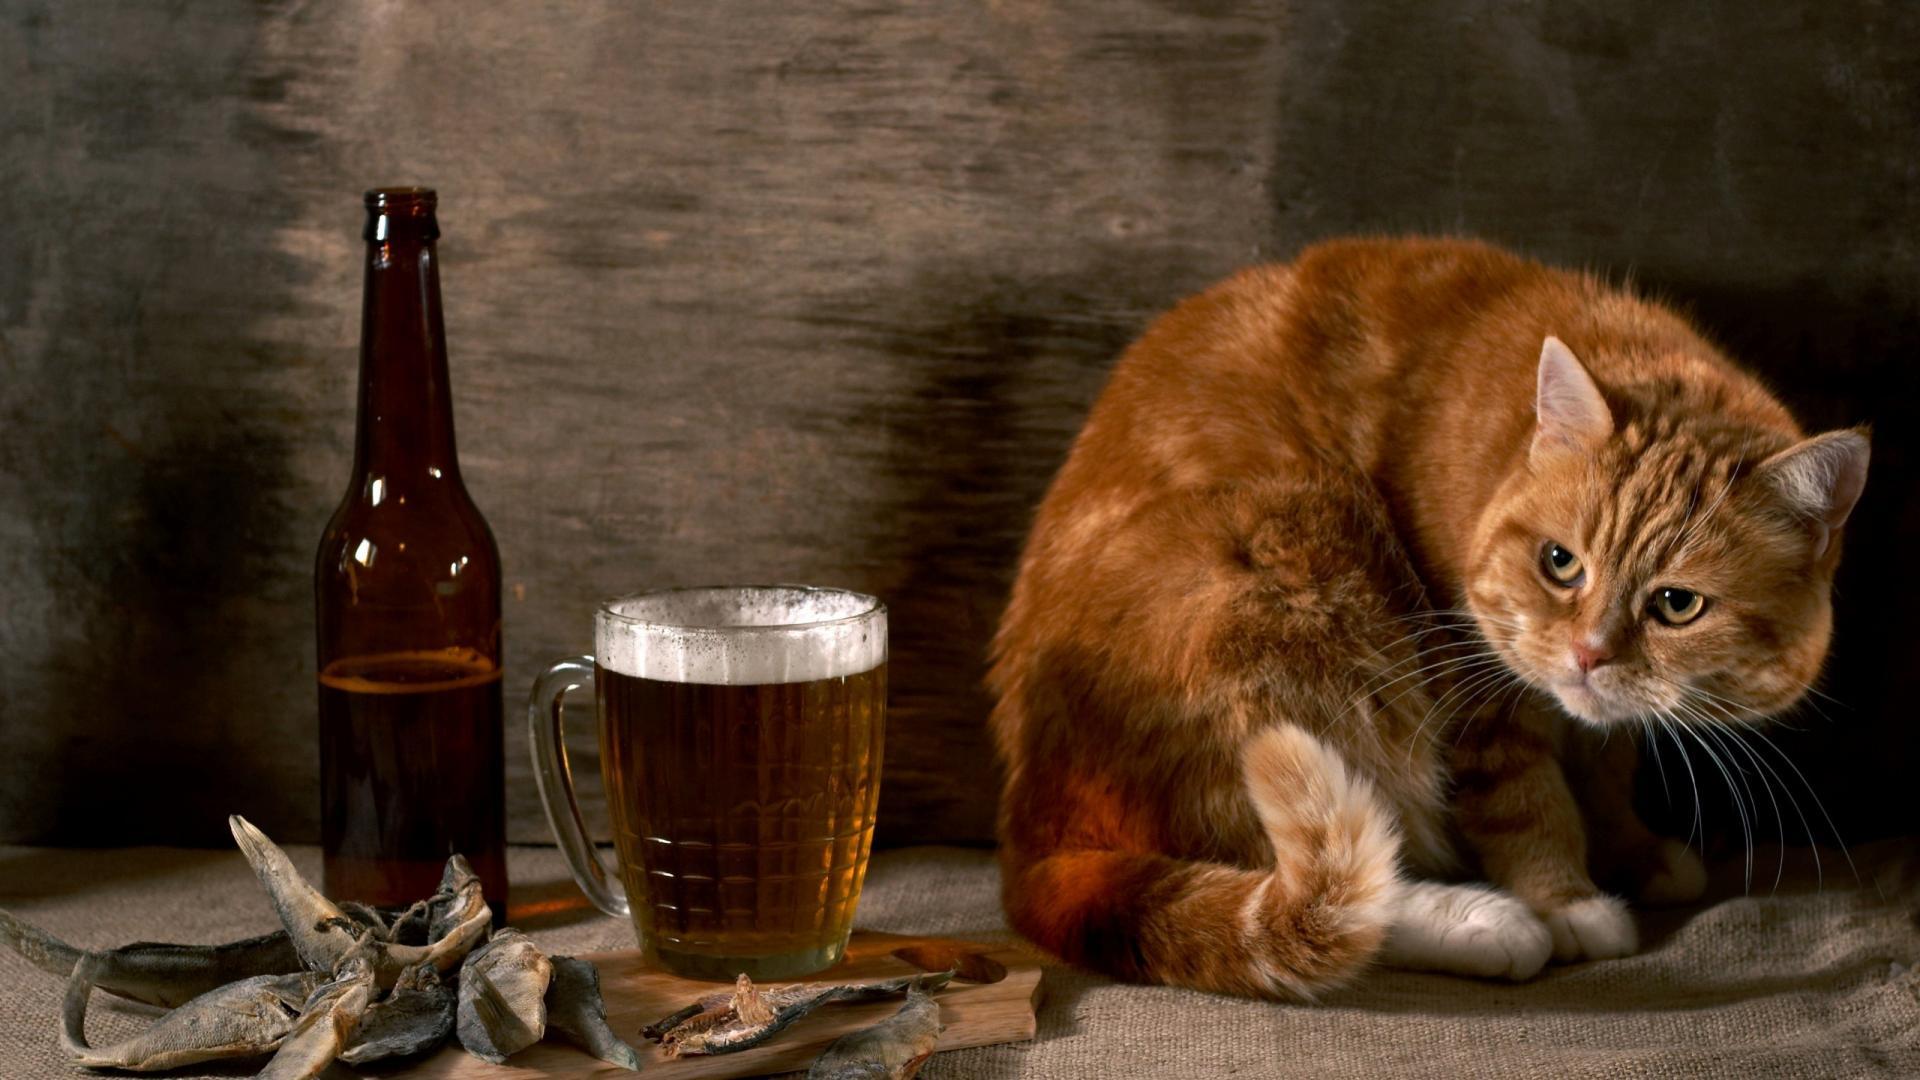 Cat-And-Beer-Funny-Animal-Wallpaper-HD-free-for-desktop.jpg